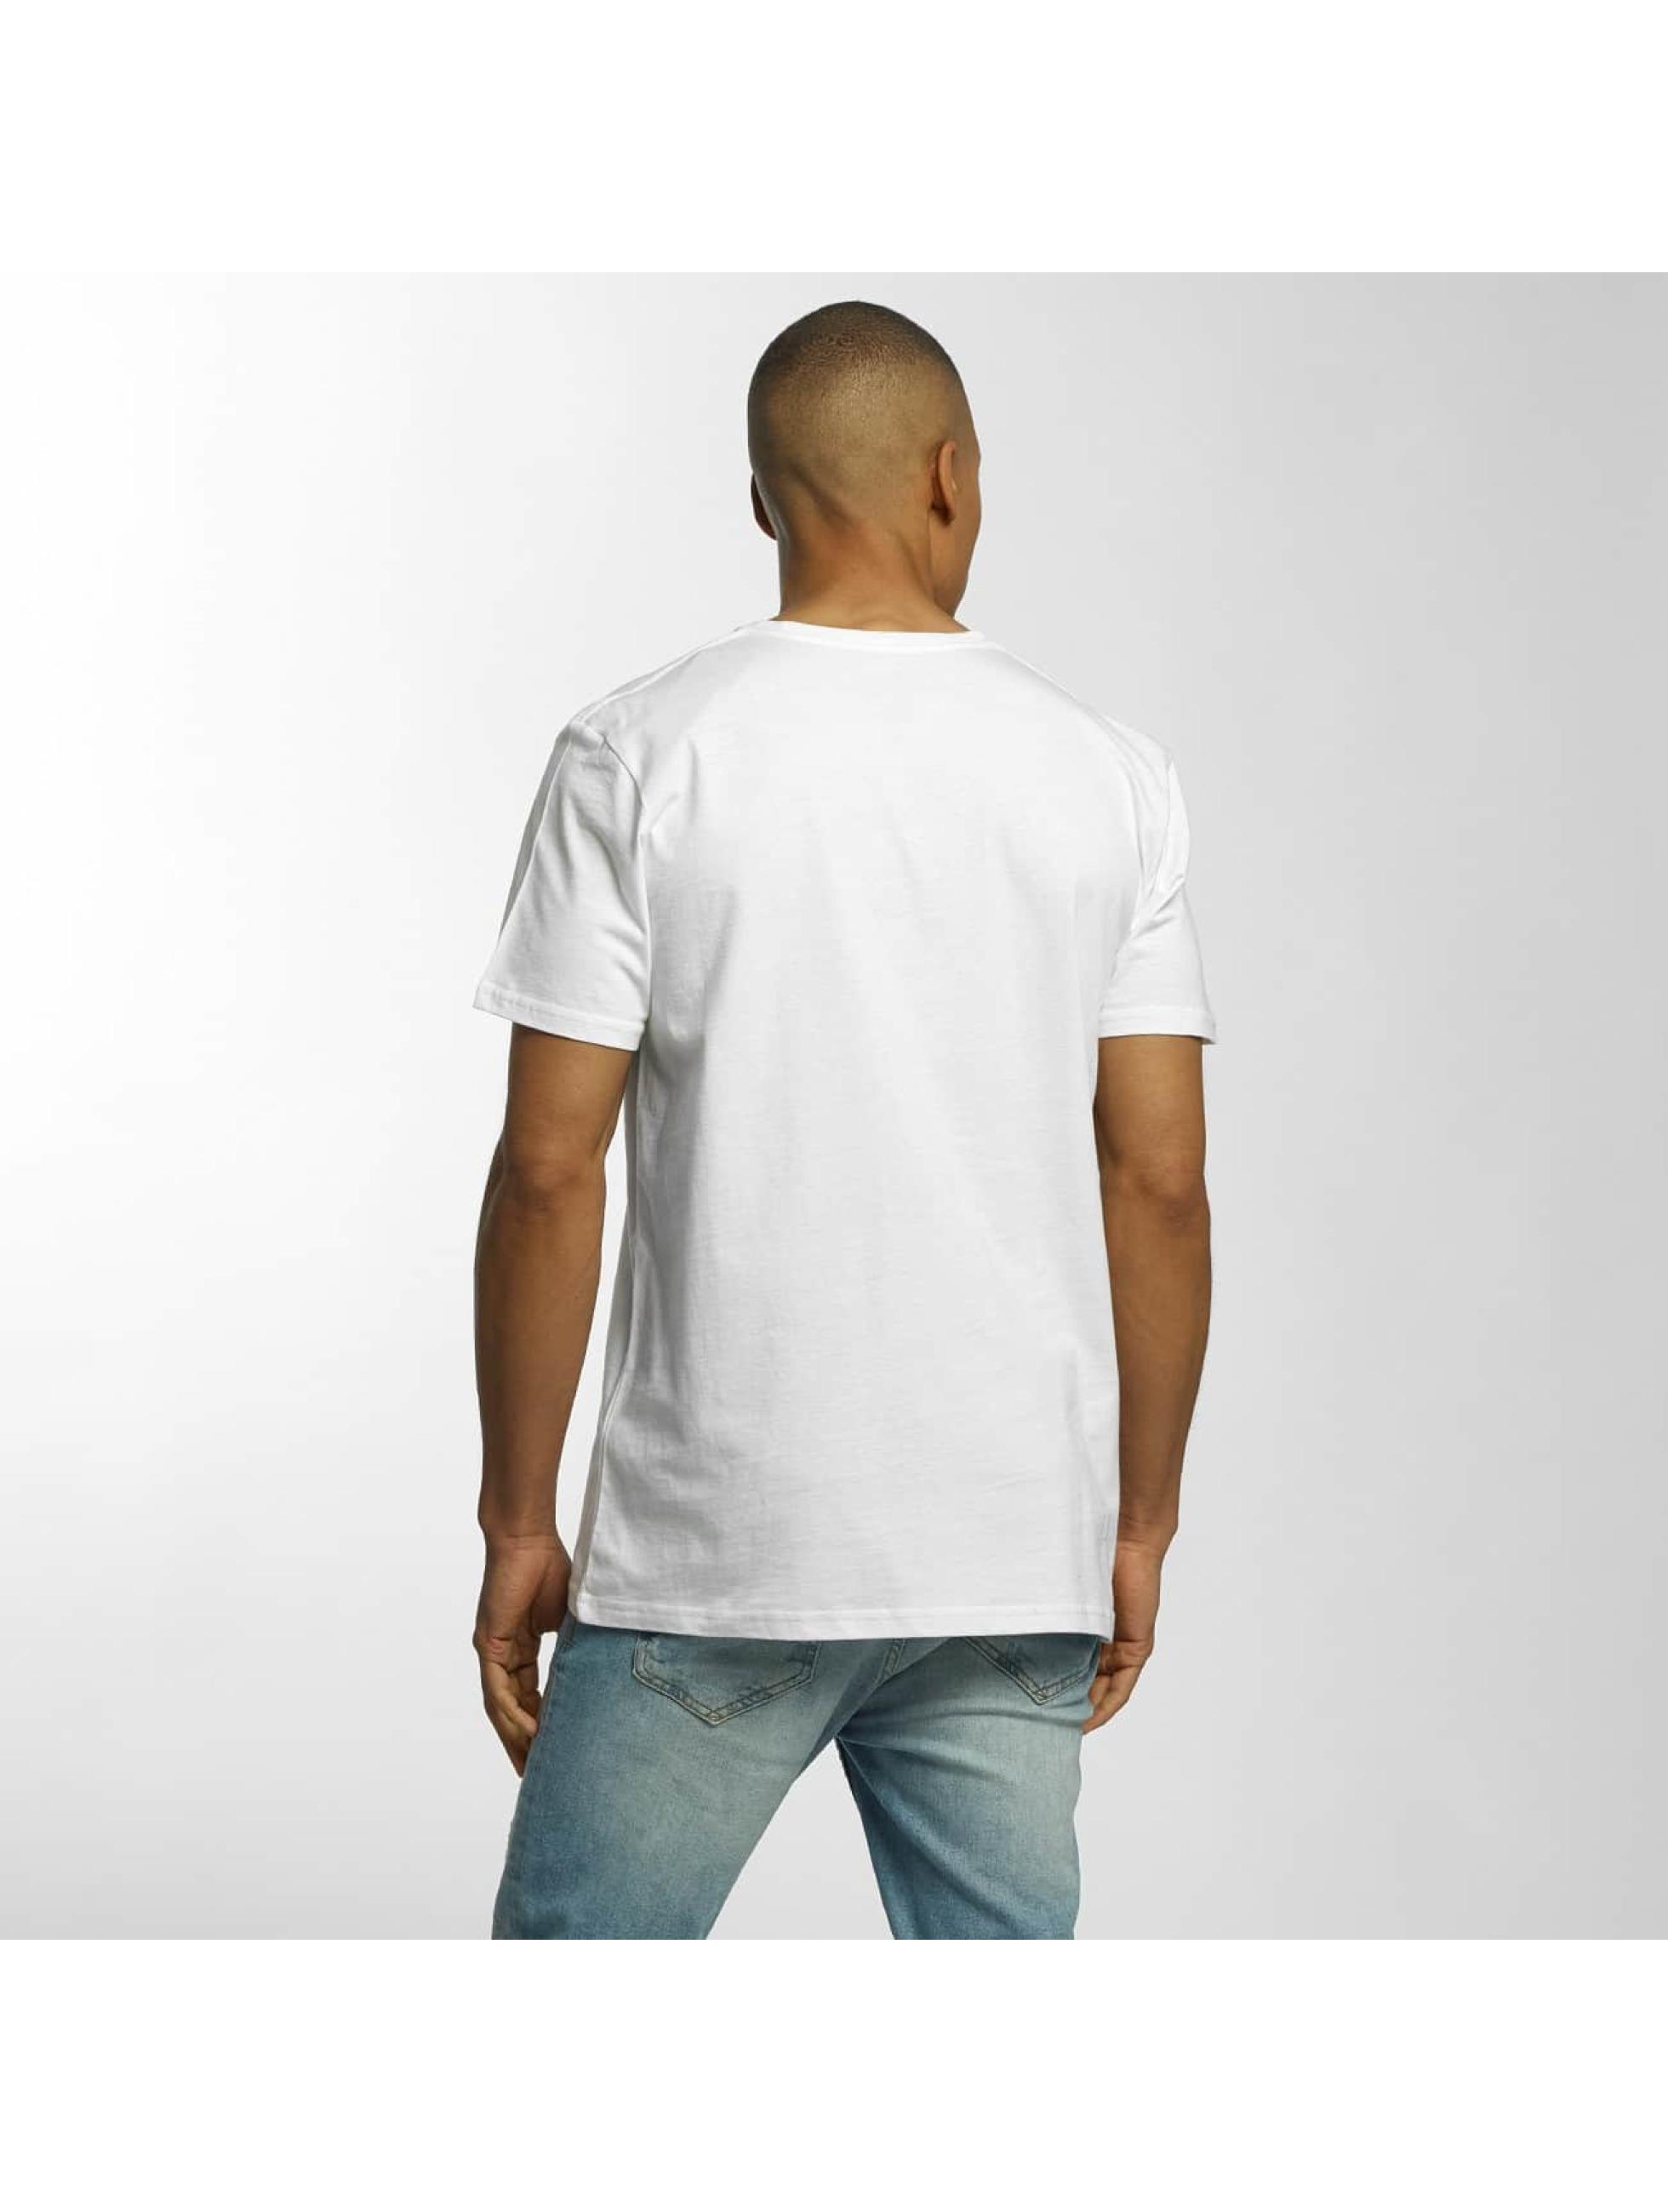 Quiksilver t-shirt Classic Sea Tales wit